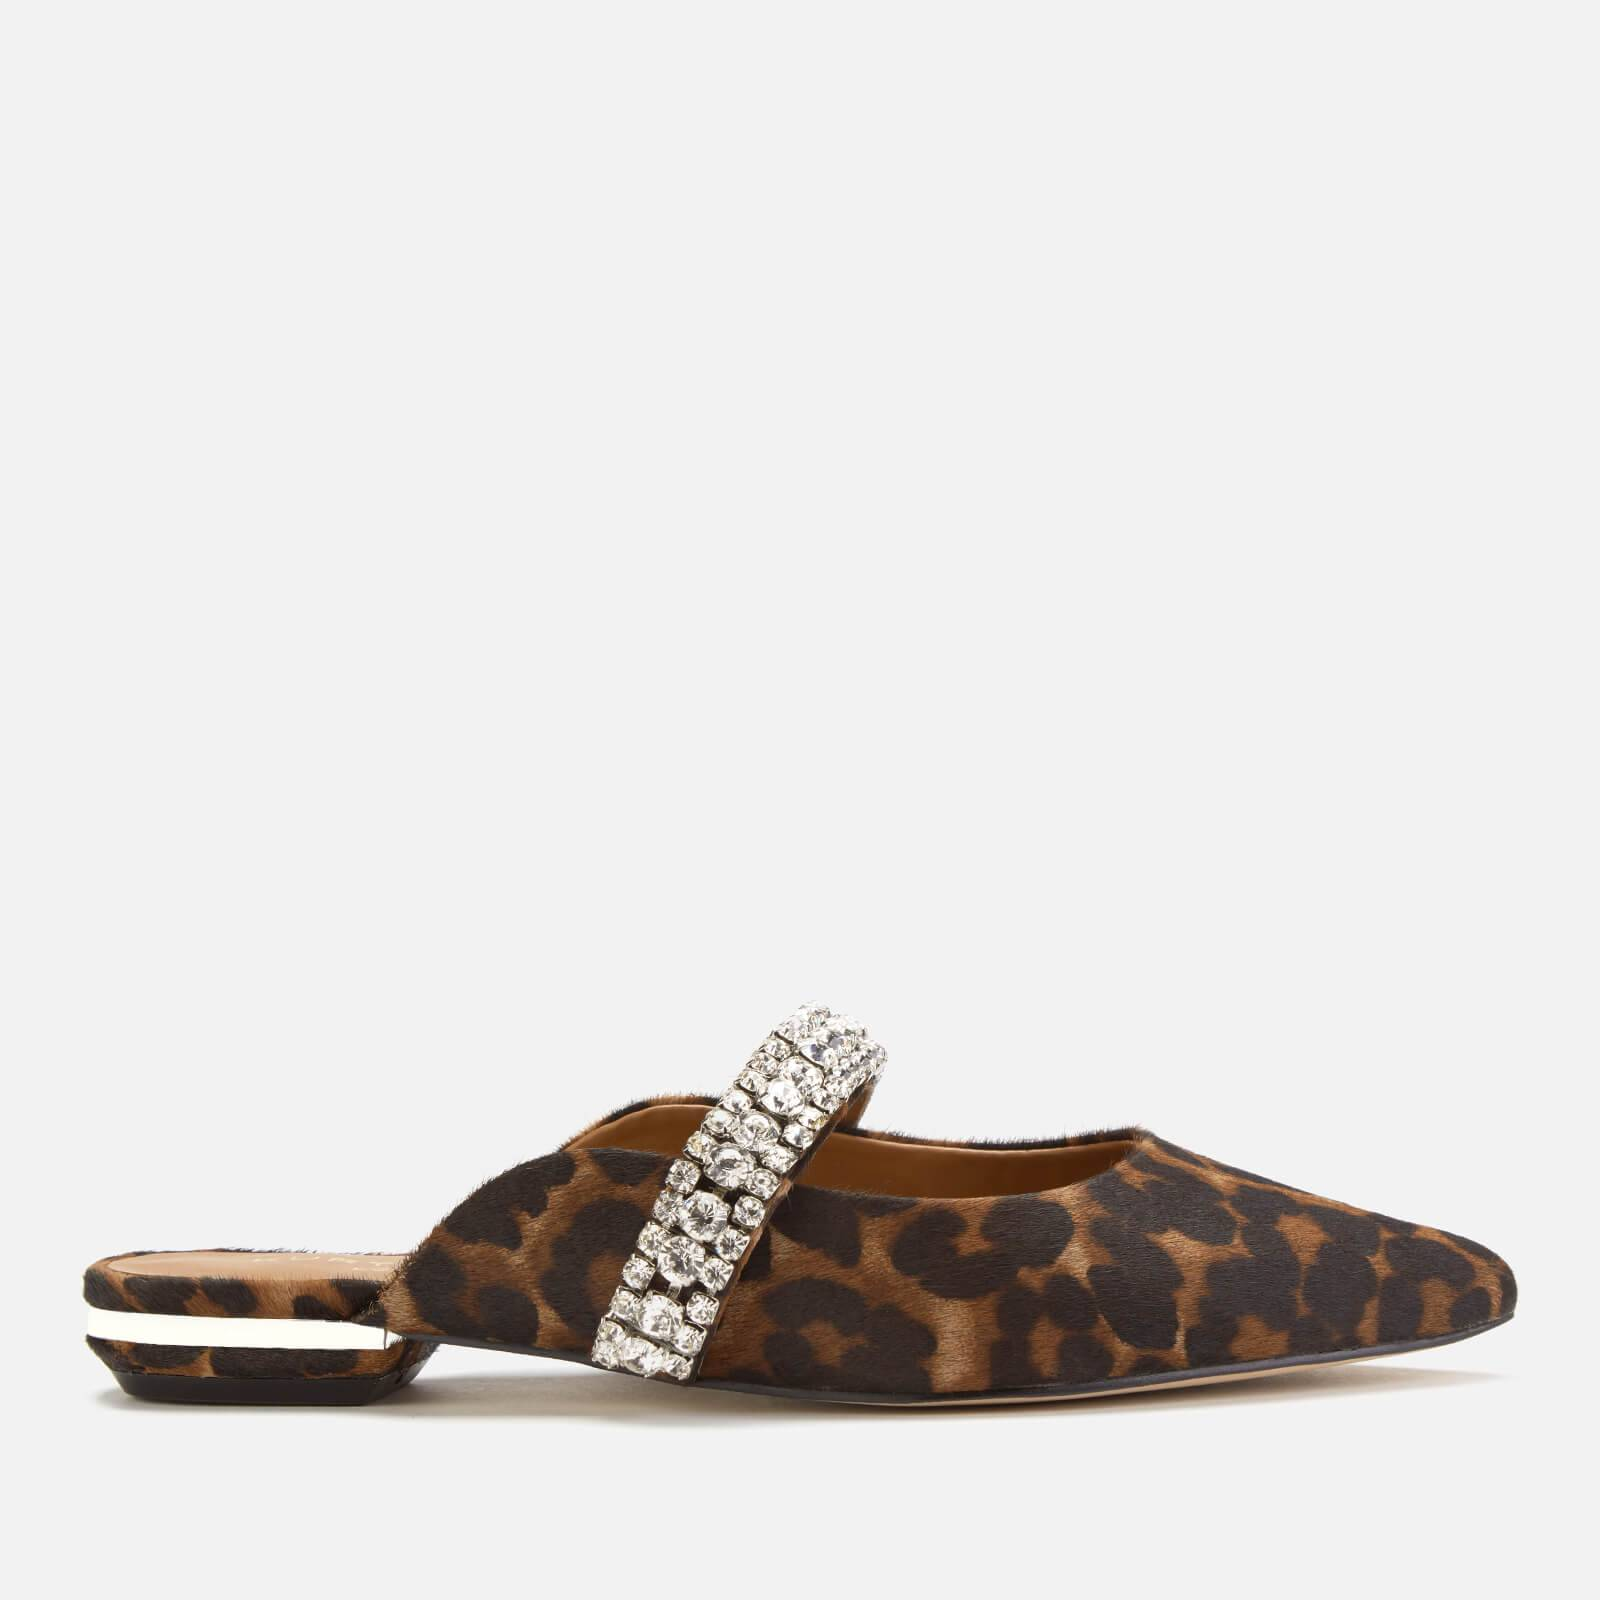 Kurt Geiger London Women's Princely Flat Mules - Cream Comb - UK 3 - Tan